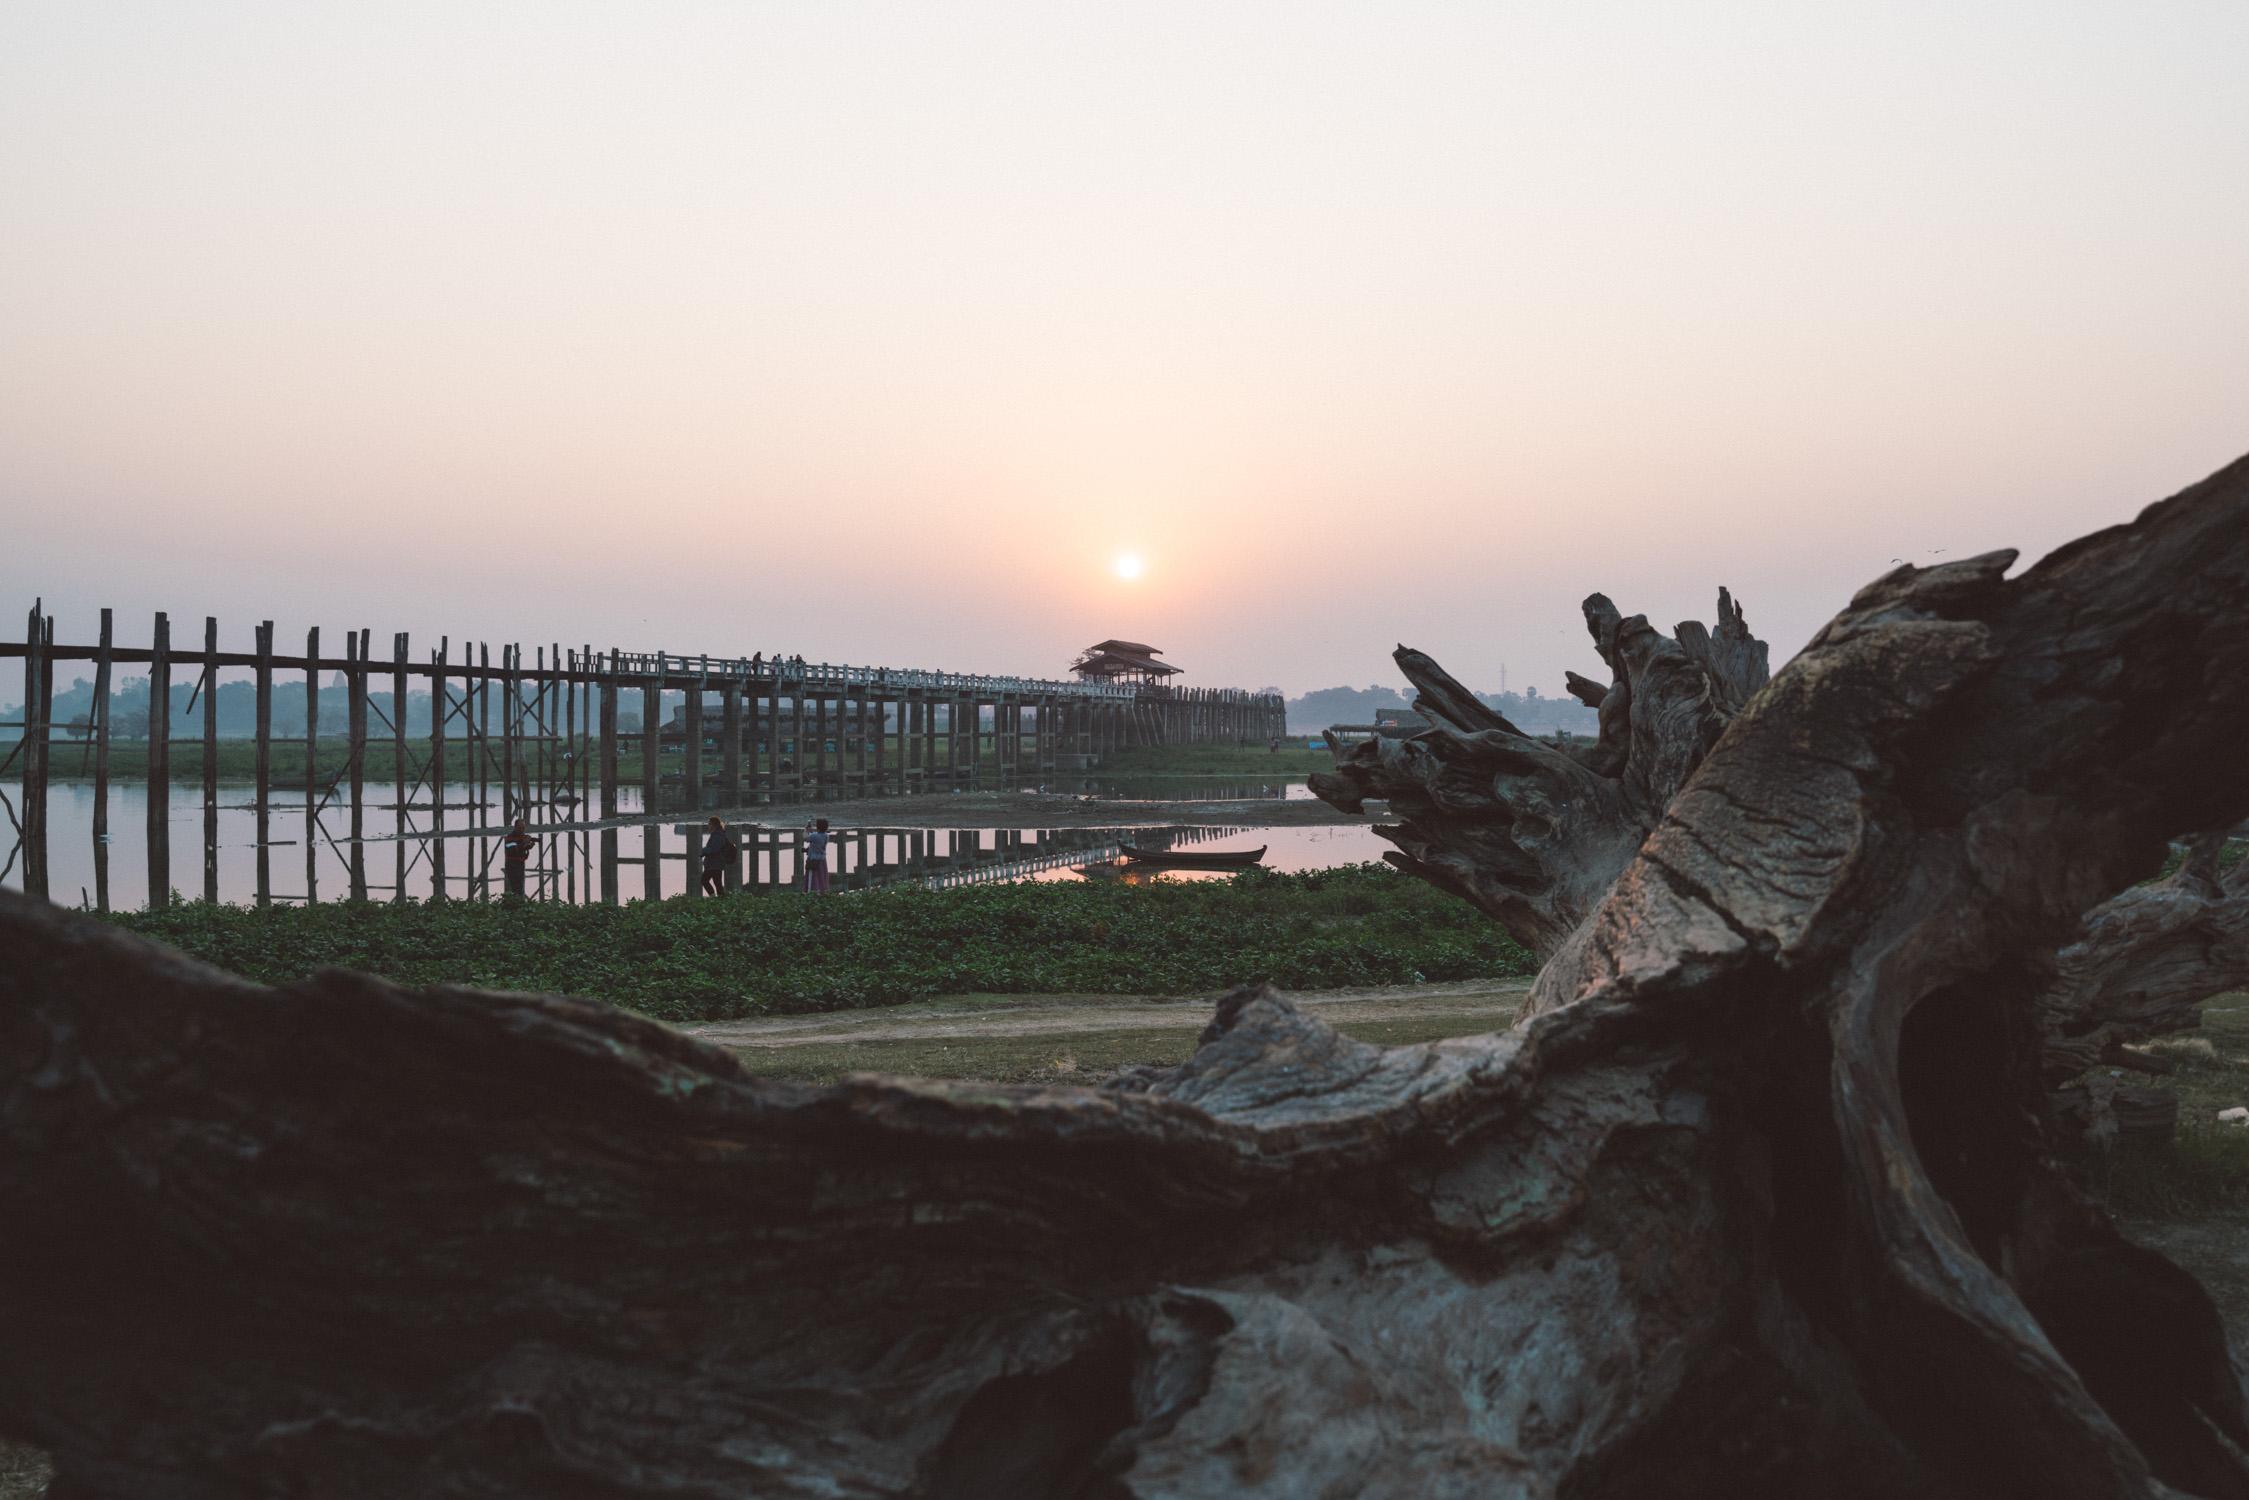 U bein bridge during sunrise [David Tan]